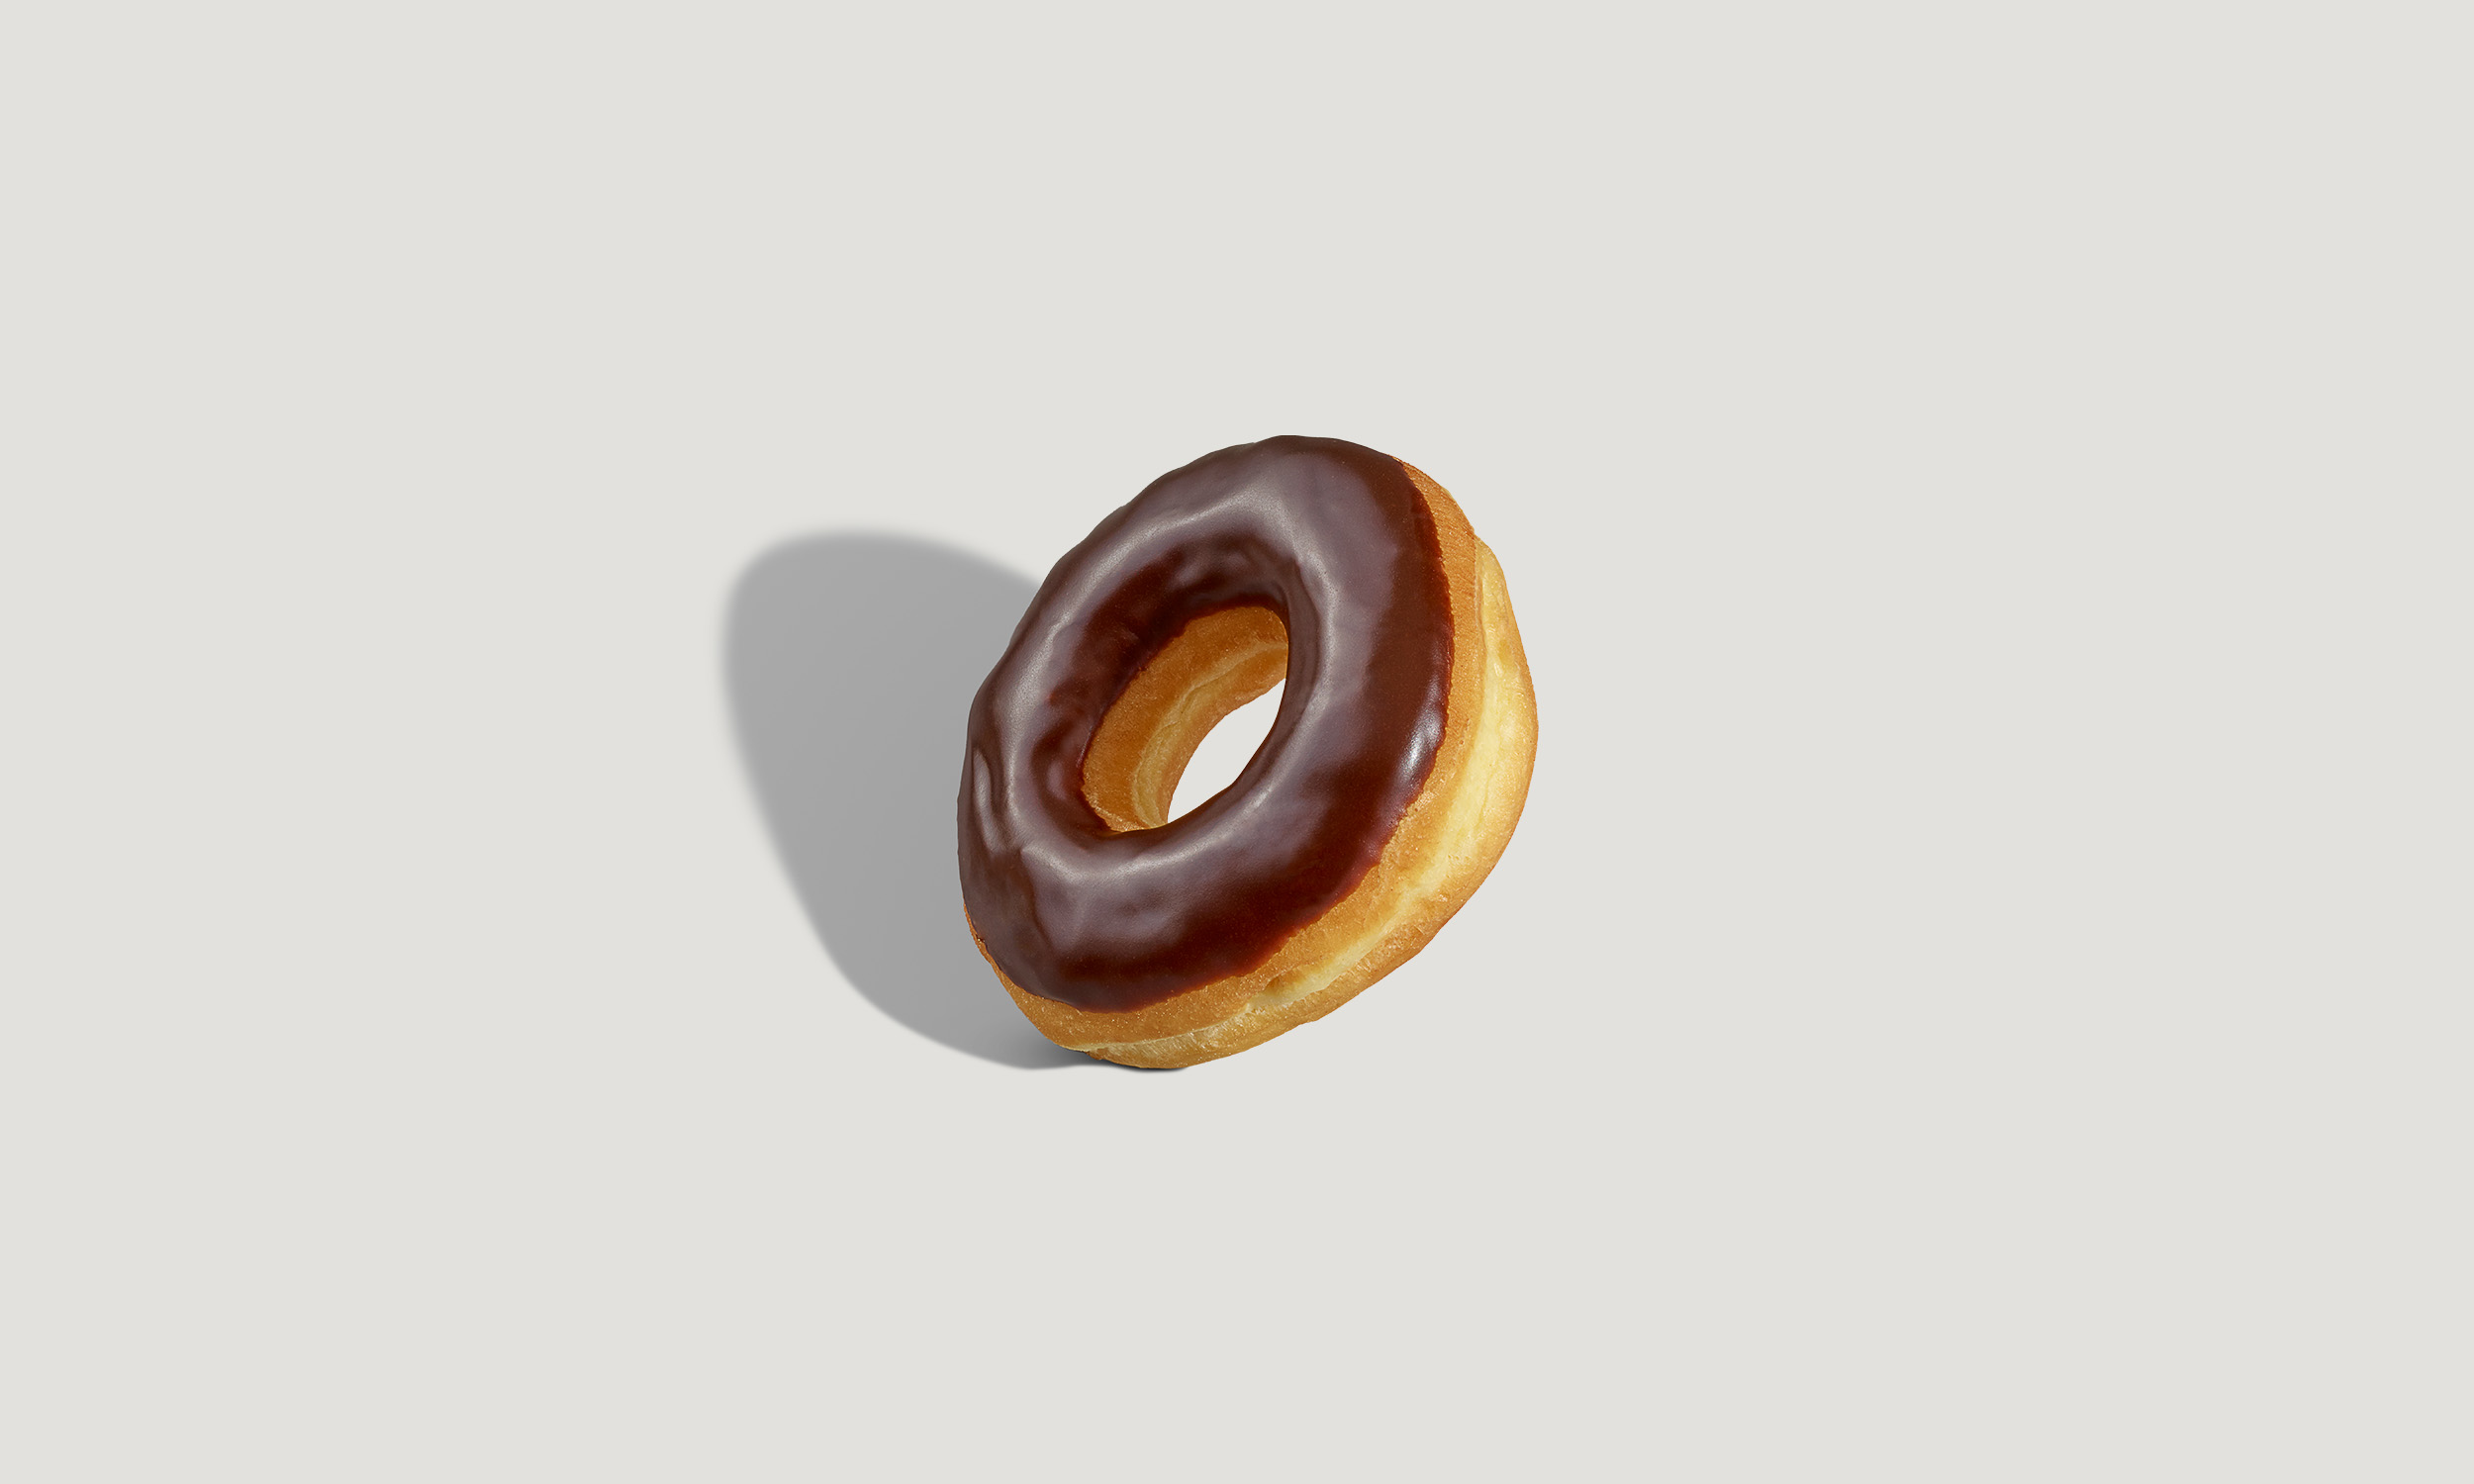 Speedway_IsometricProductPhotography_Donut-Chocolate.jpg